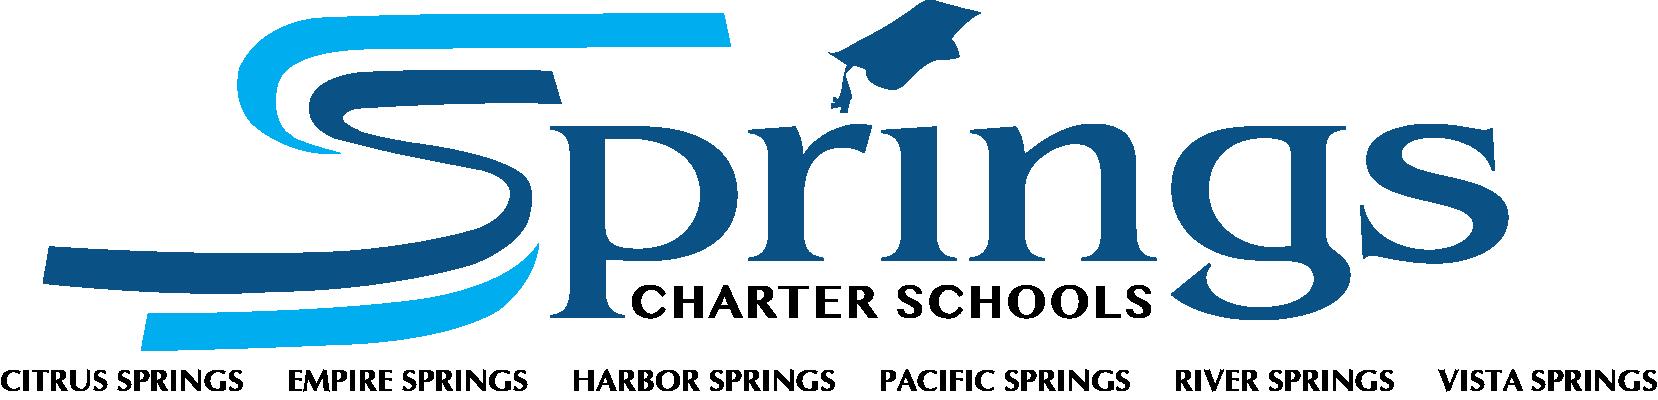 Springs Charter School Company Logo